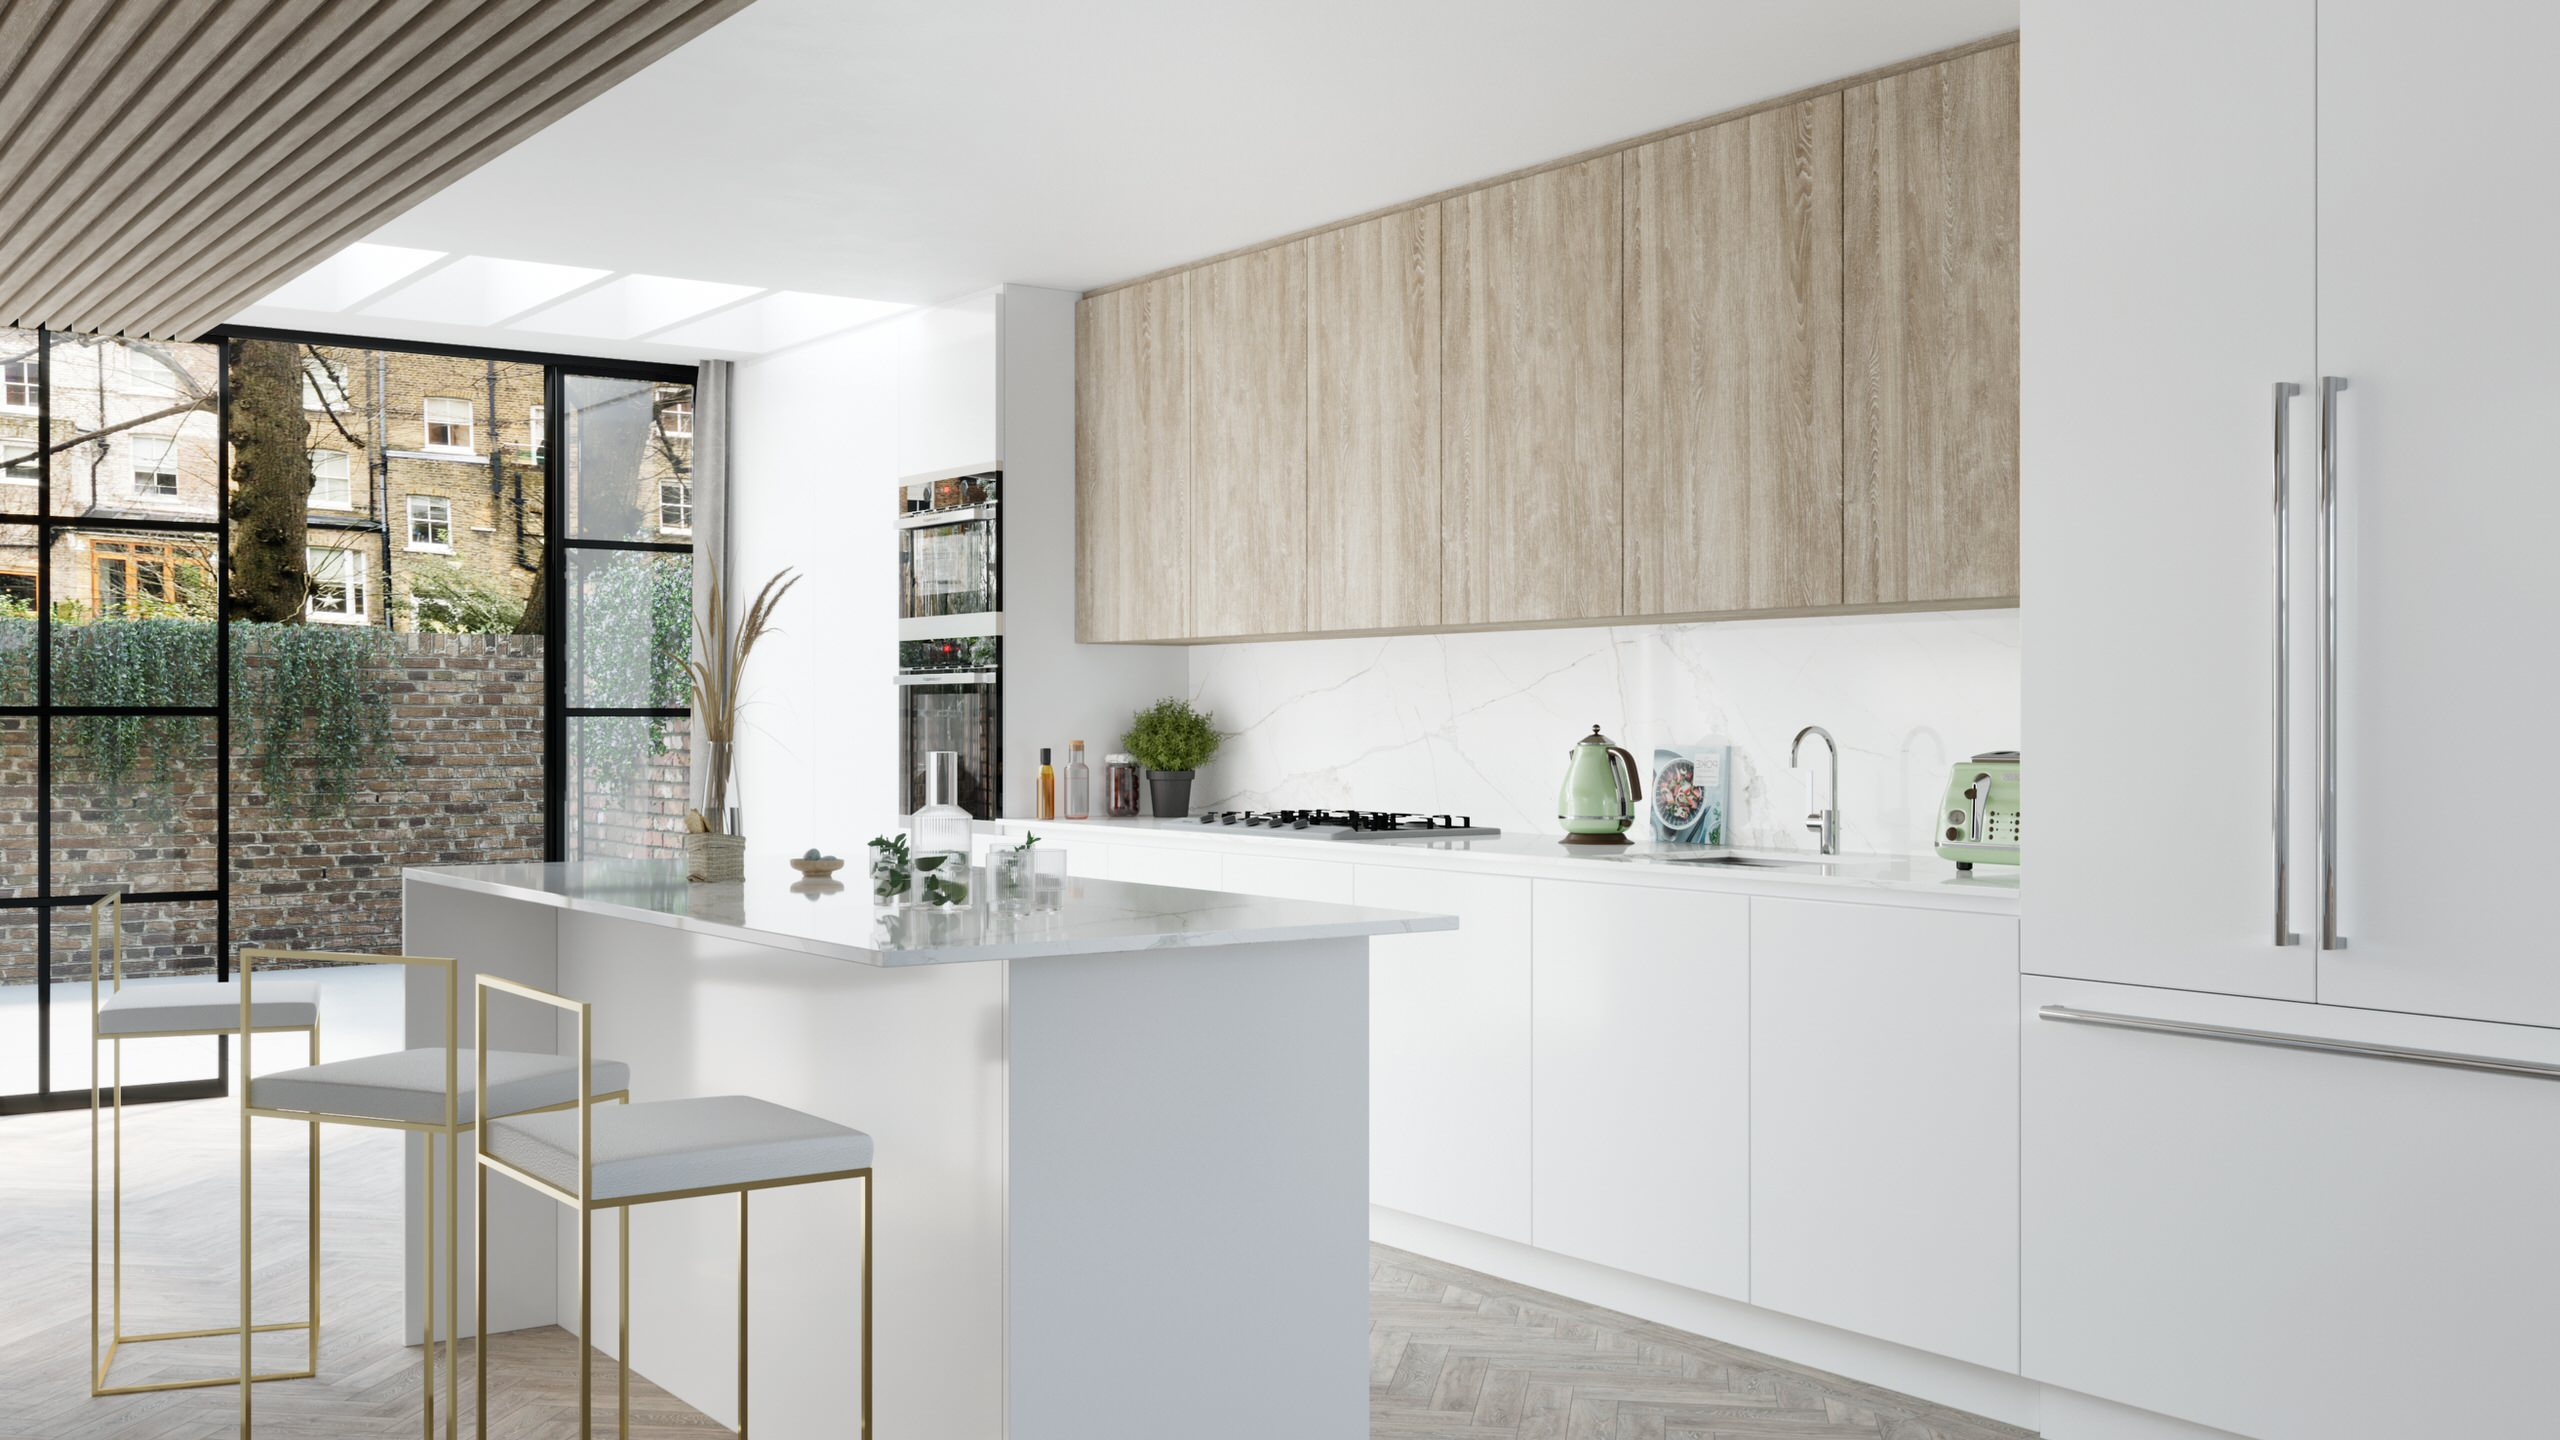 Hampstead house - Option 1